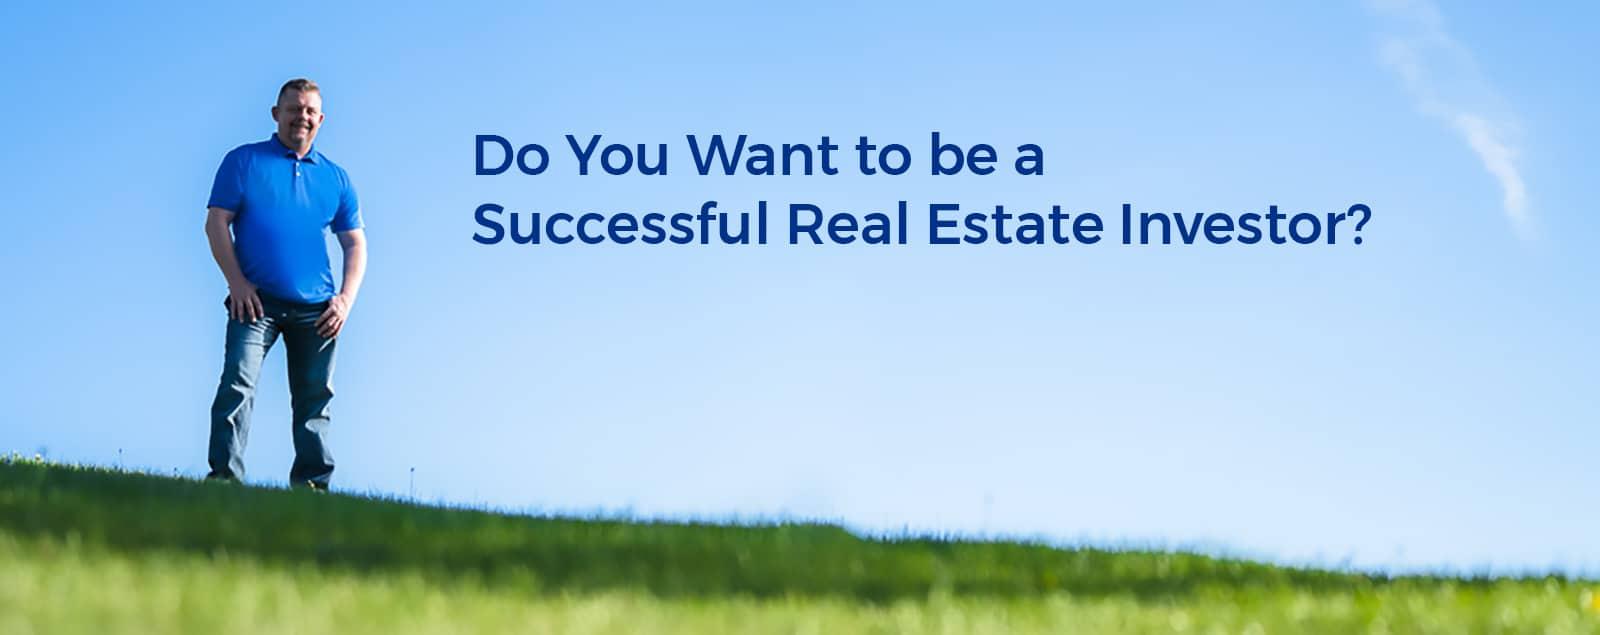 real-estate-investor-head-image